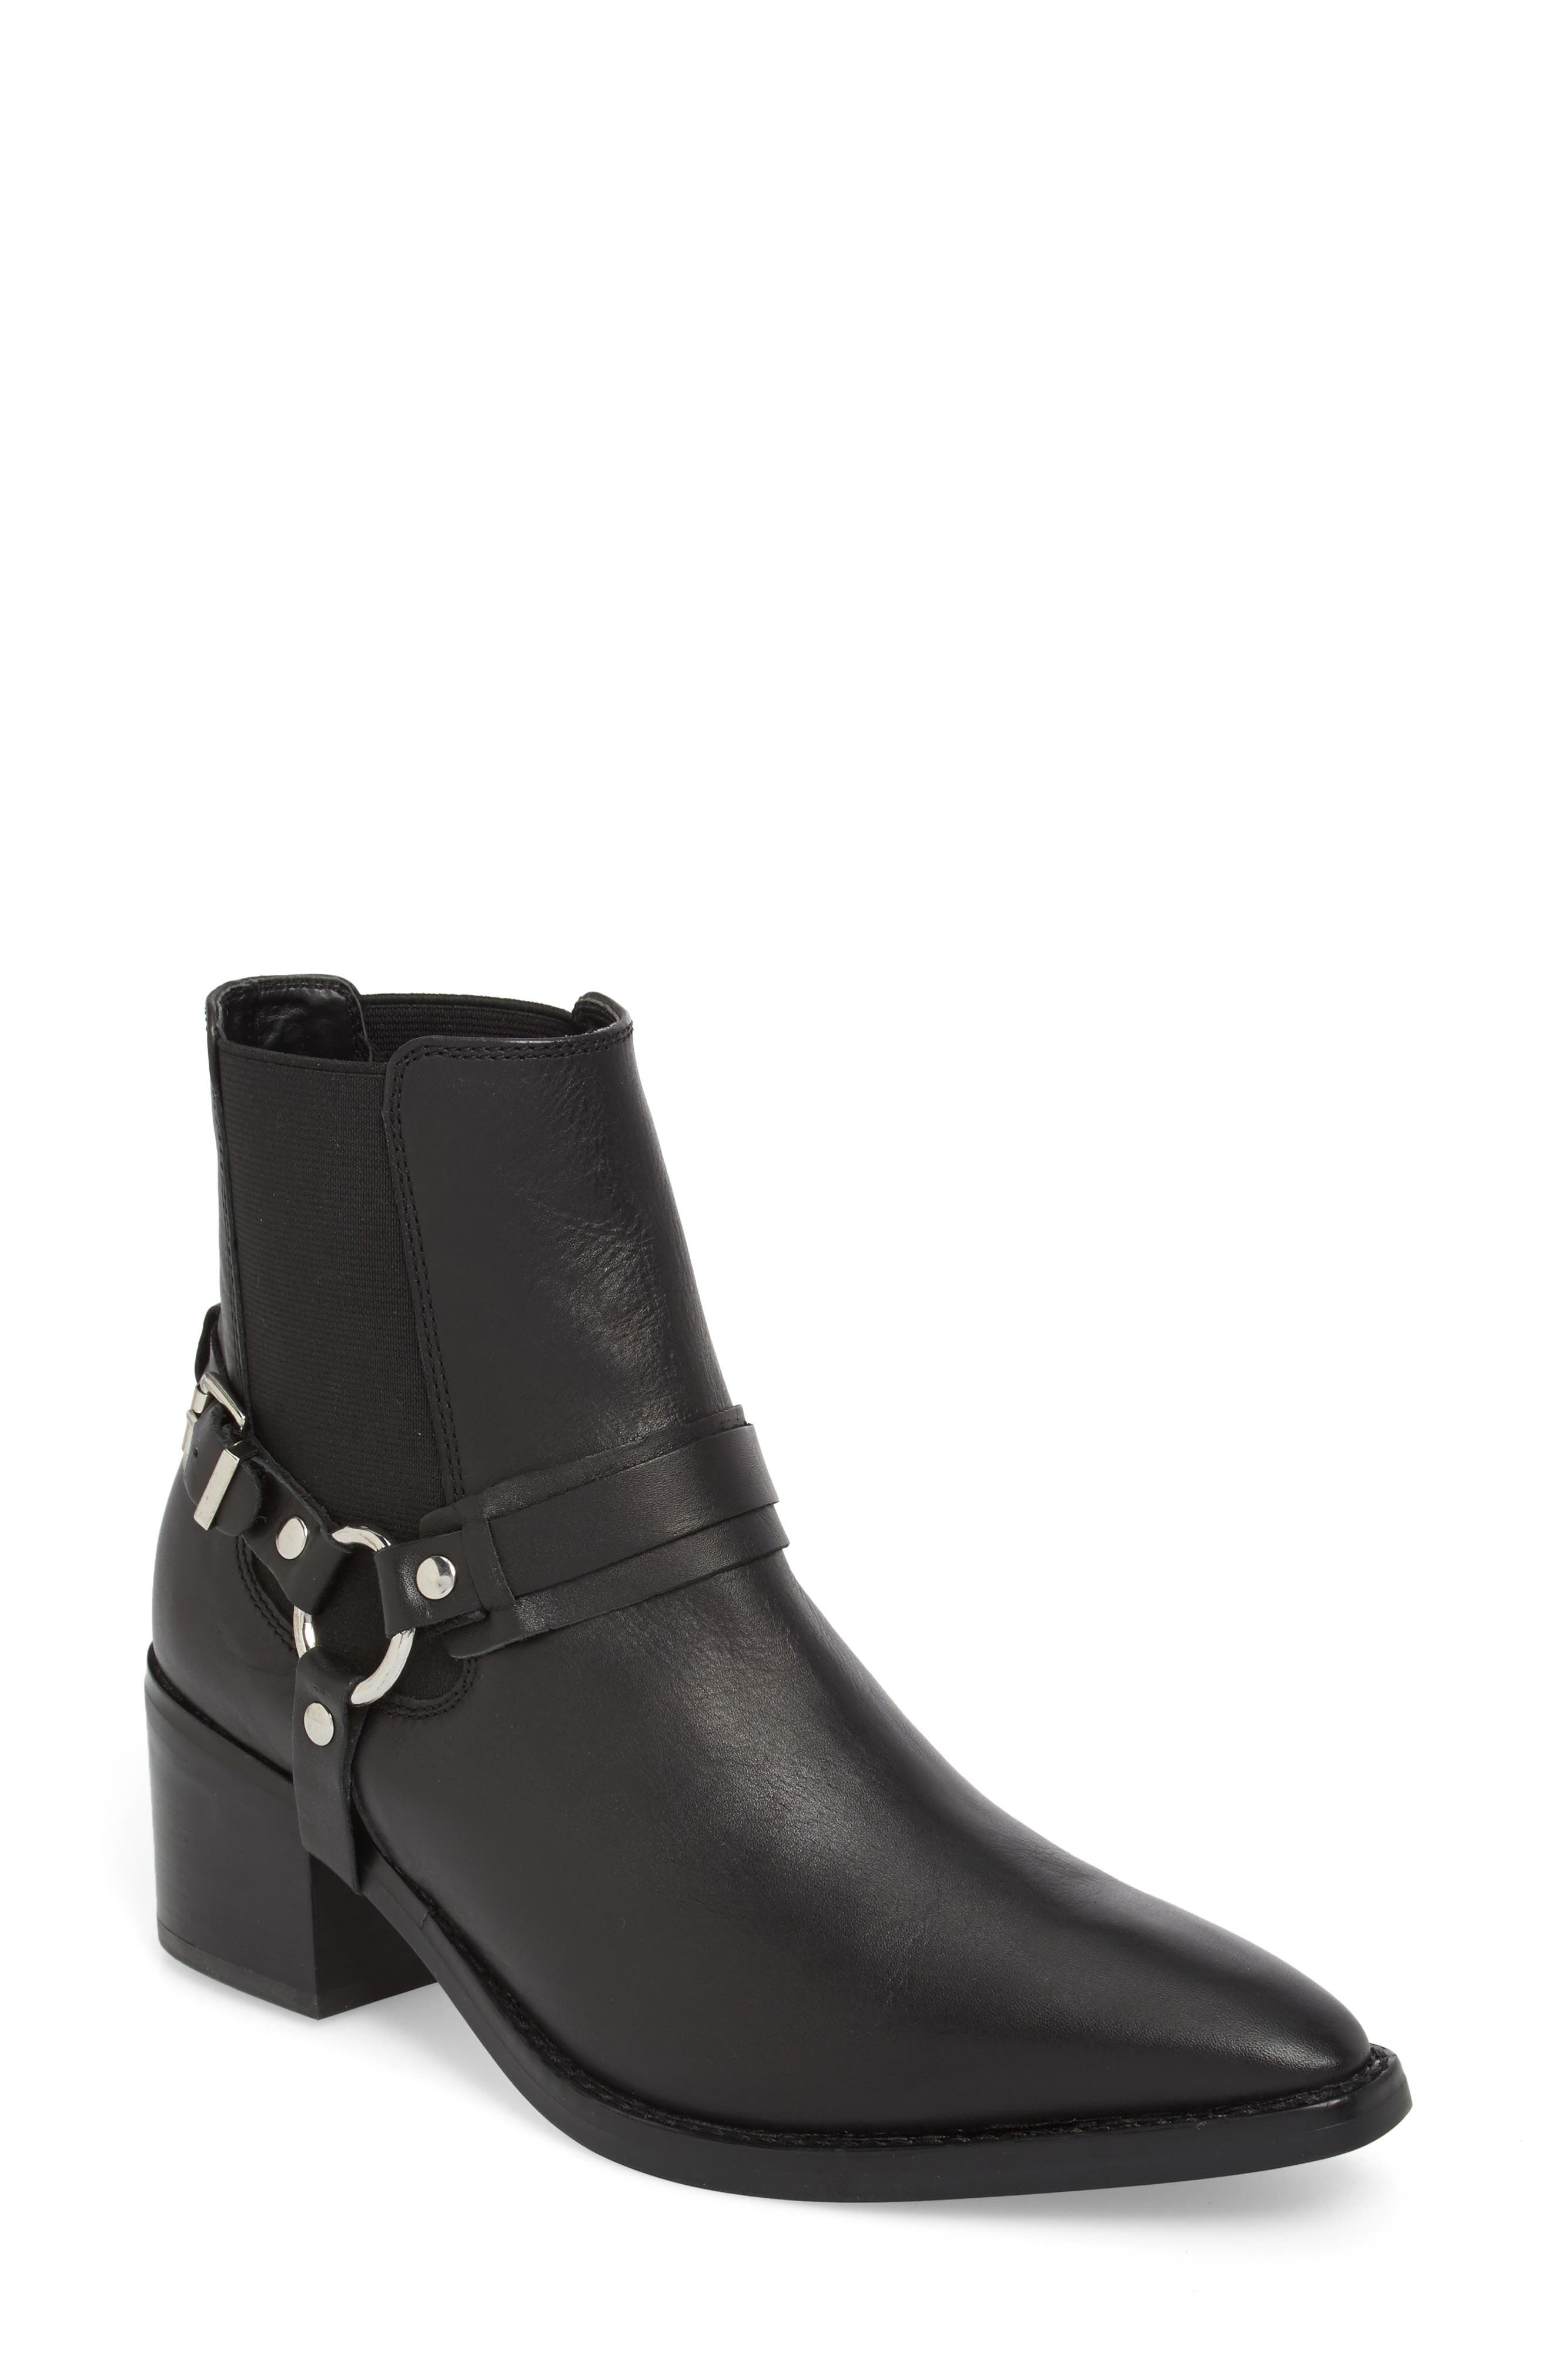 Sabana Engineer Boot,                             Main thumbnail 1, color,                             Black Albany Leather